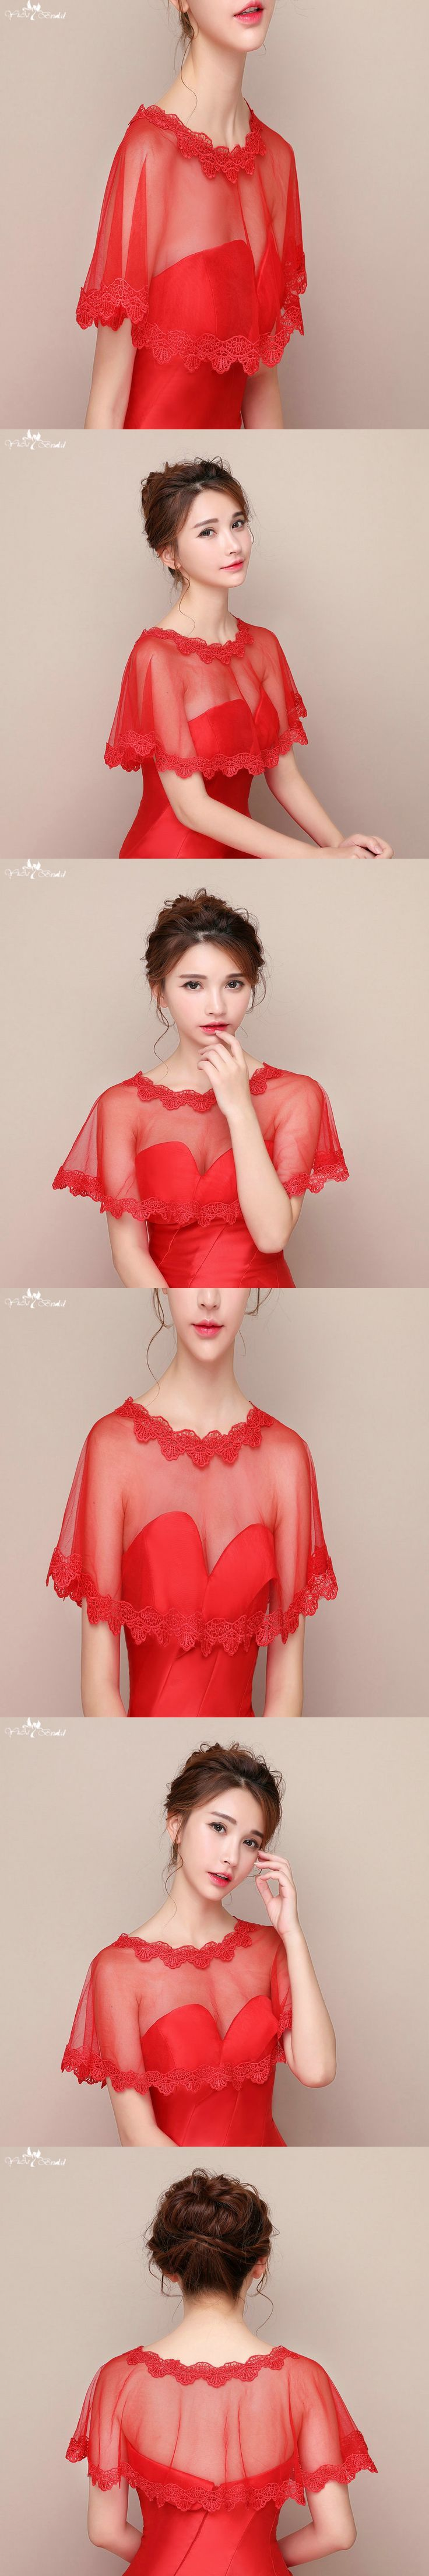 LZP089 Simple One Layer Red Lace Edge Lace Bolero Wedding Shawl